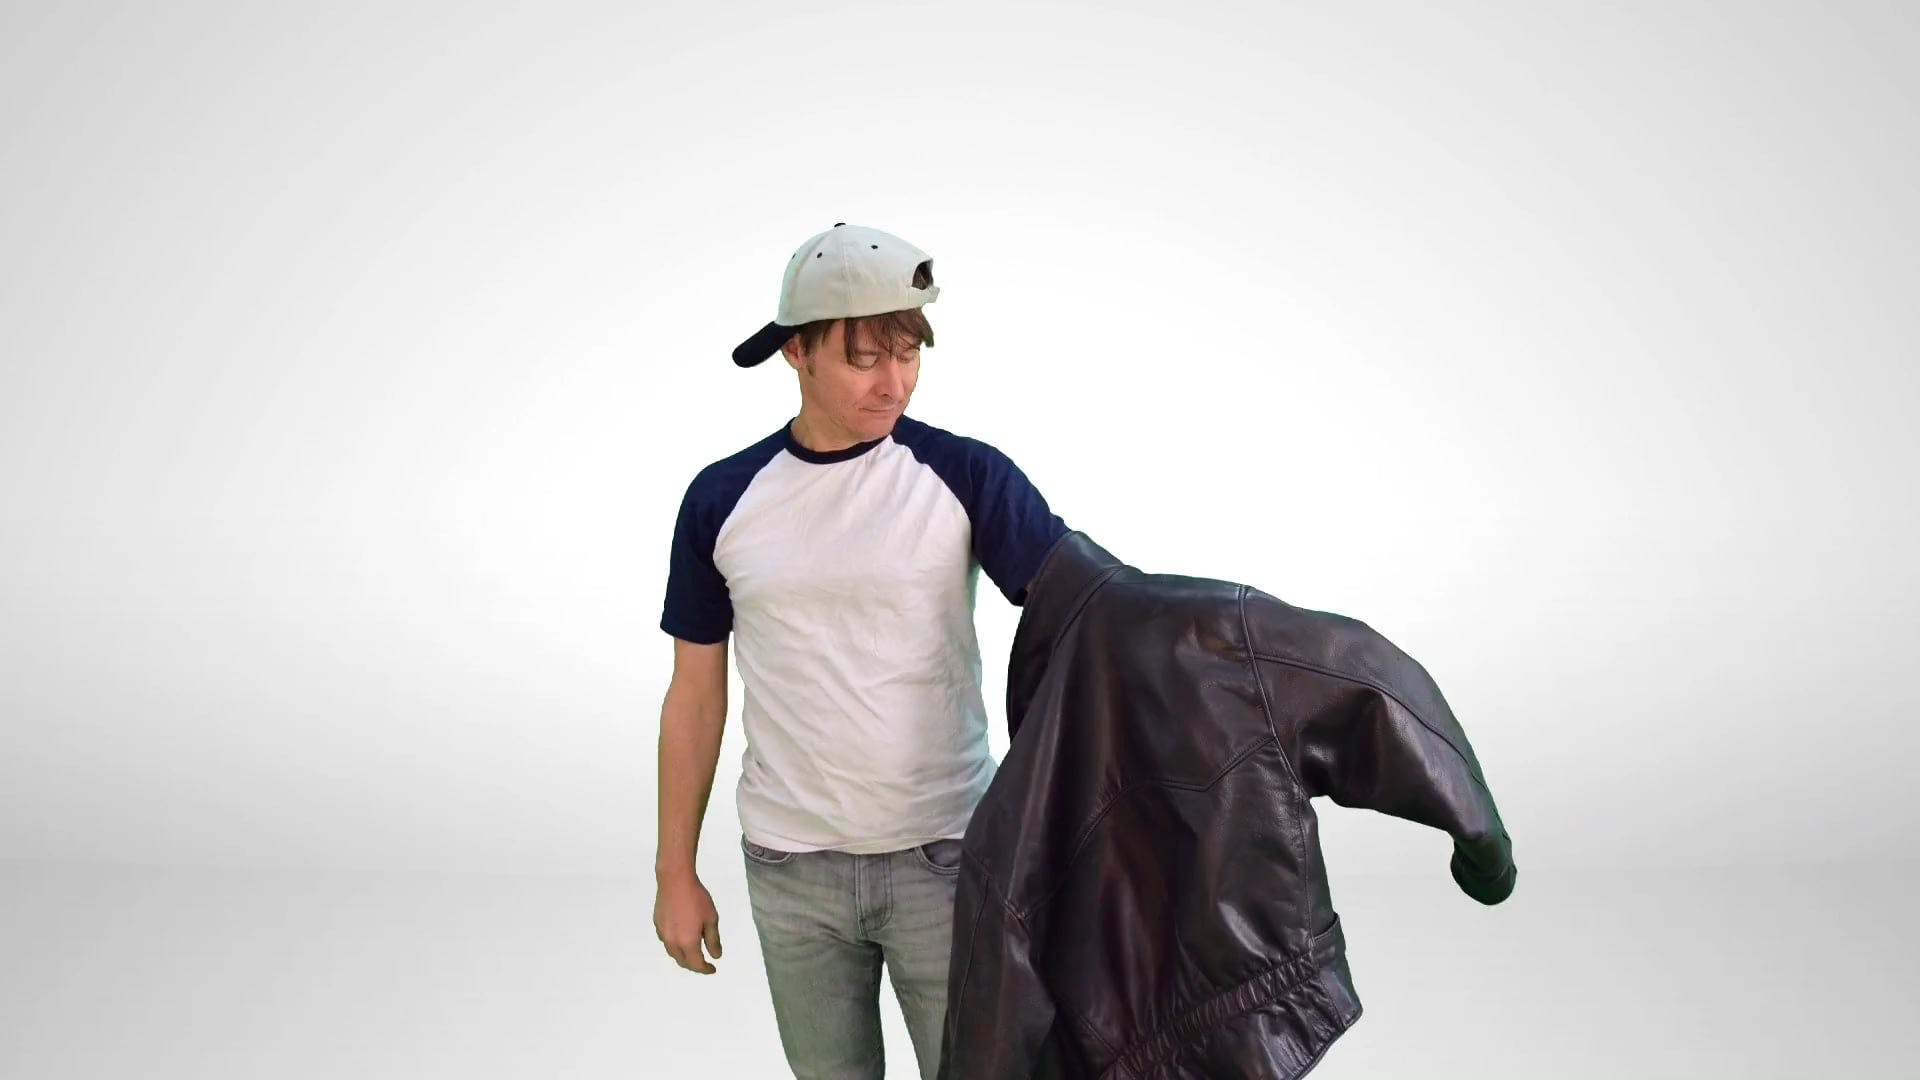 Stop Motion Video Of Man Wearing Jacket